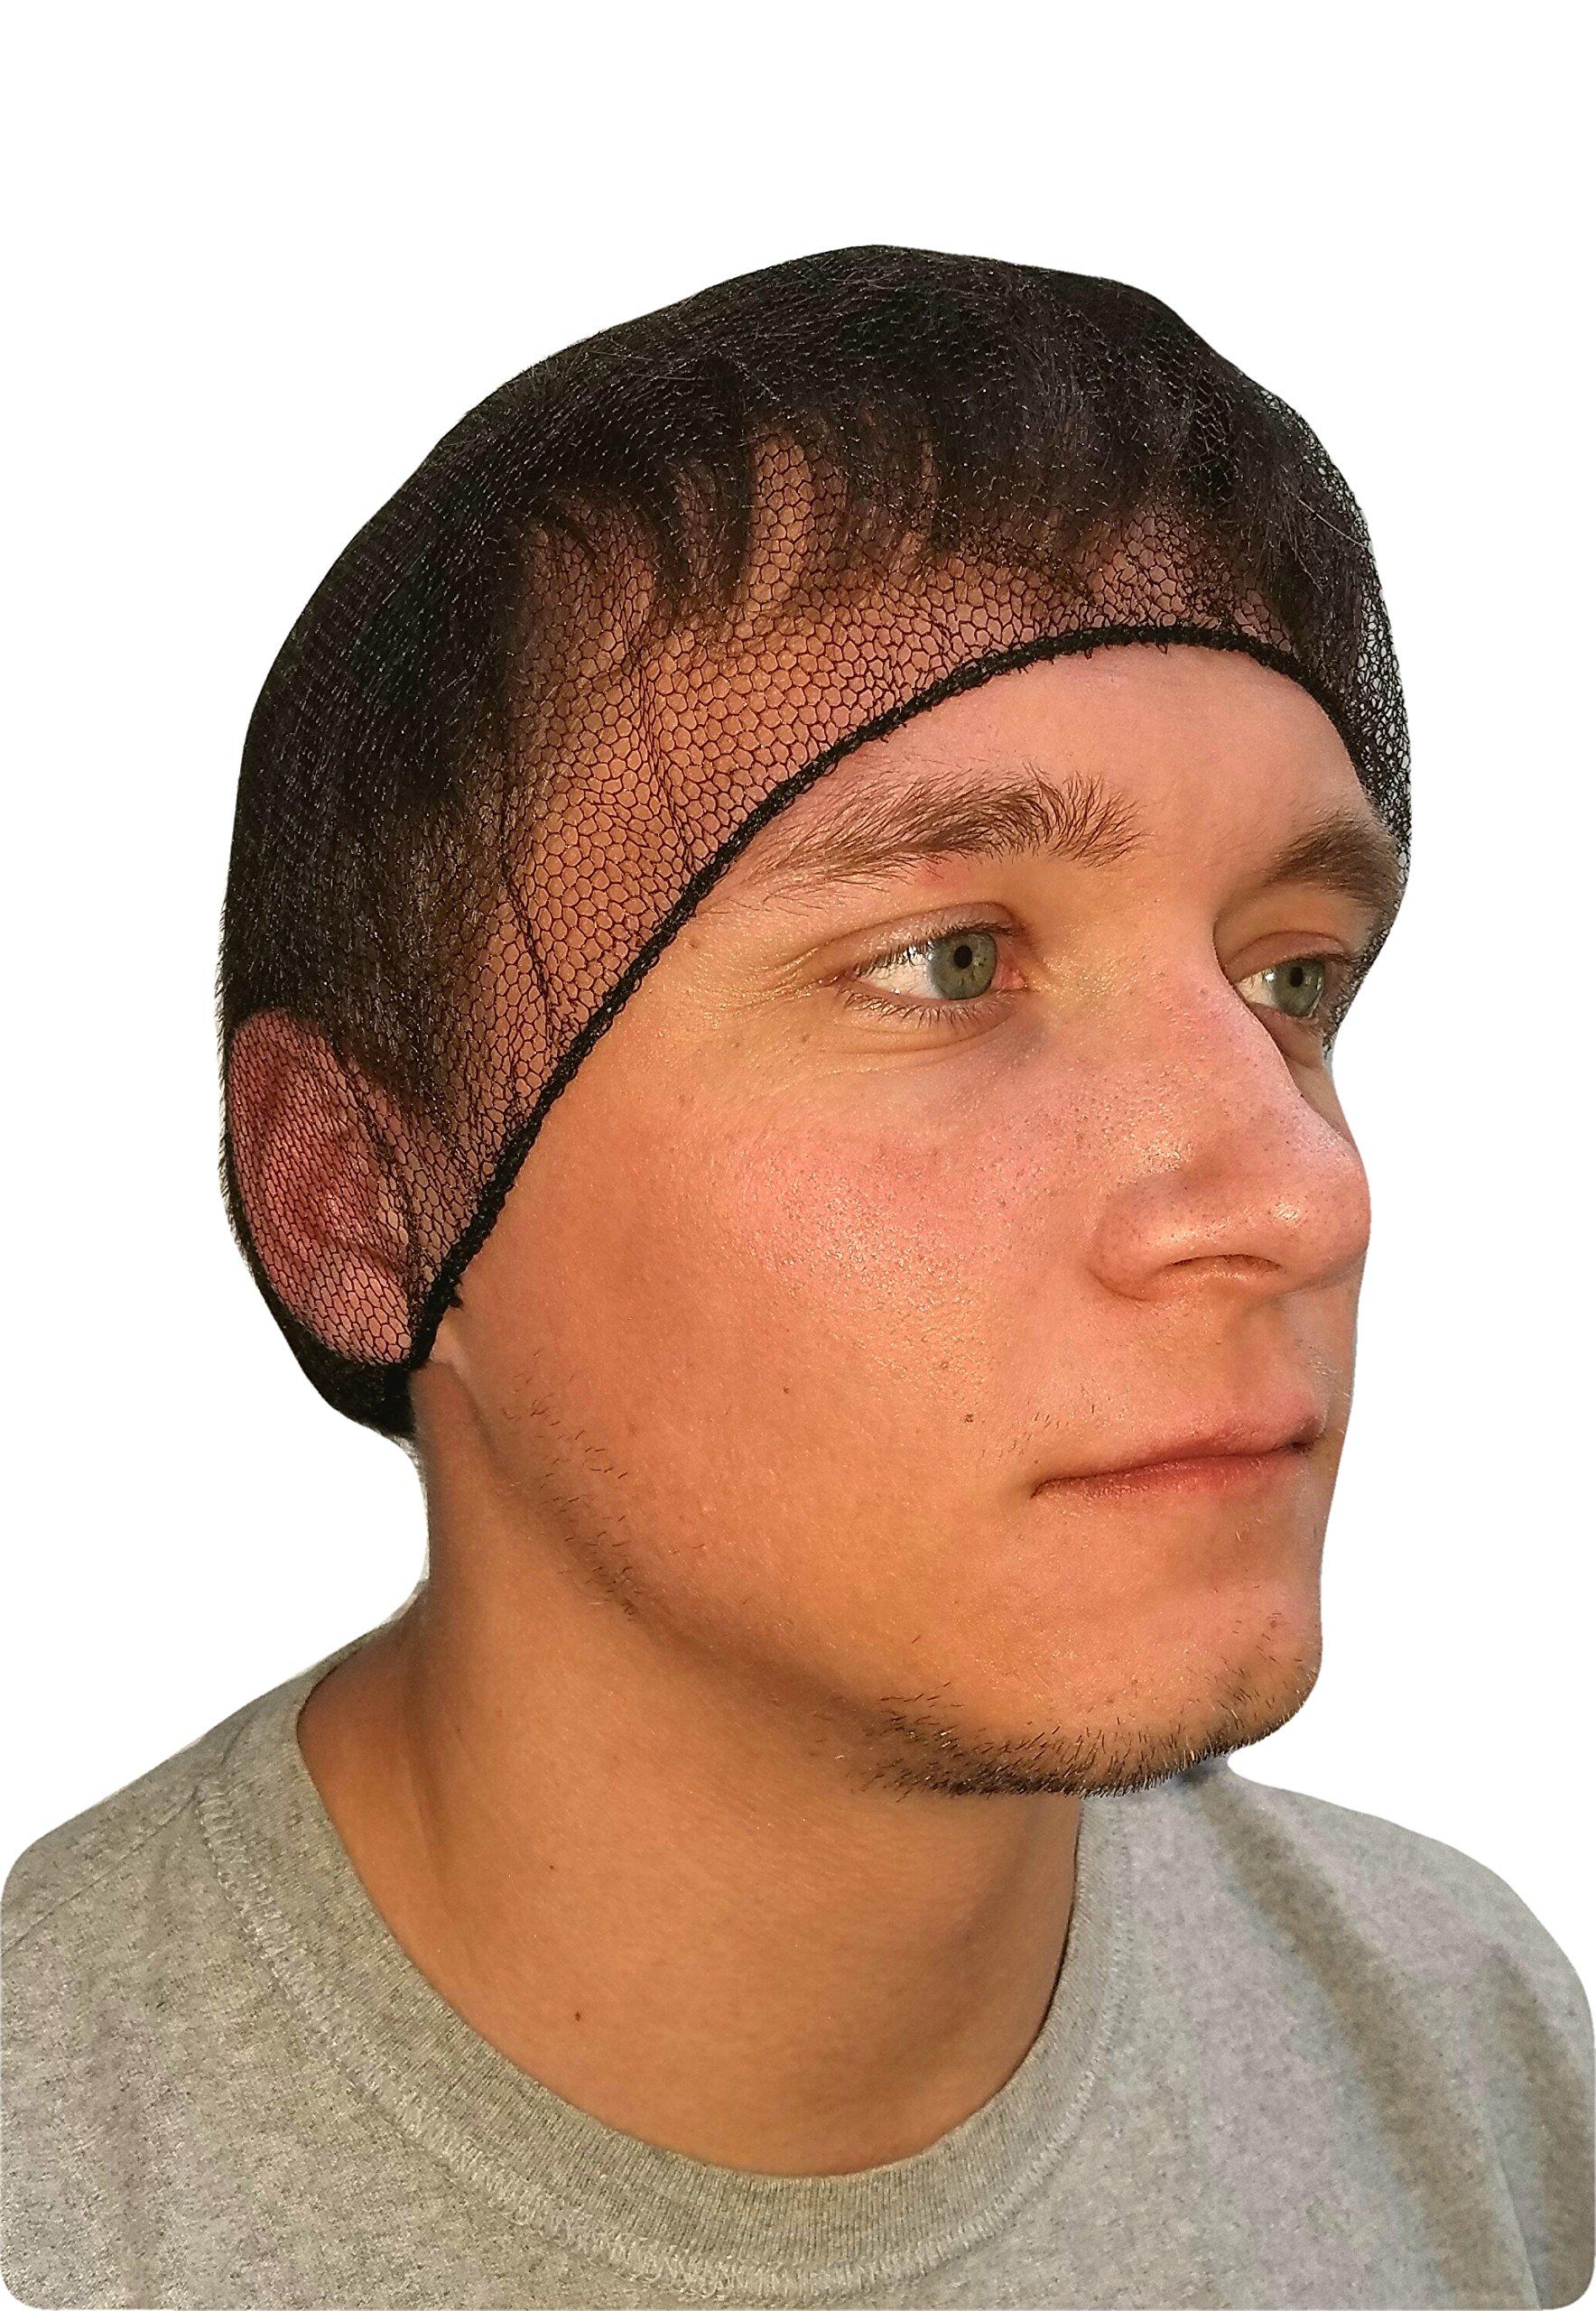 ProCES Disposable Hairnet - Black (144 Pack) by ProCES